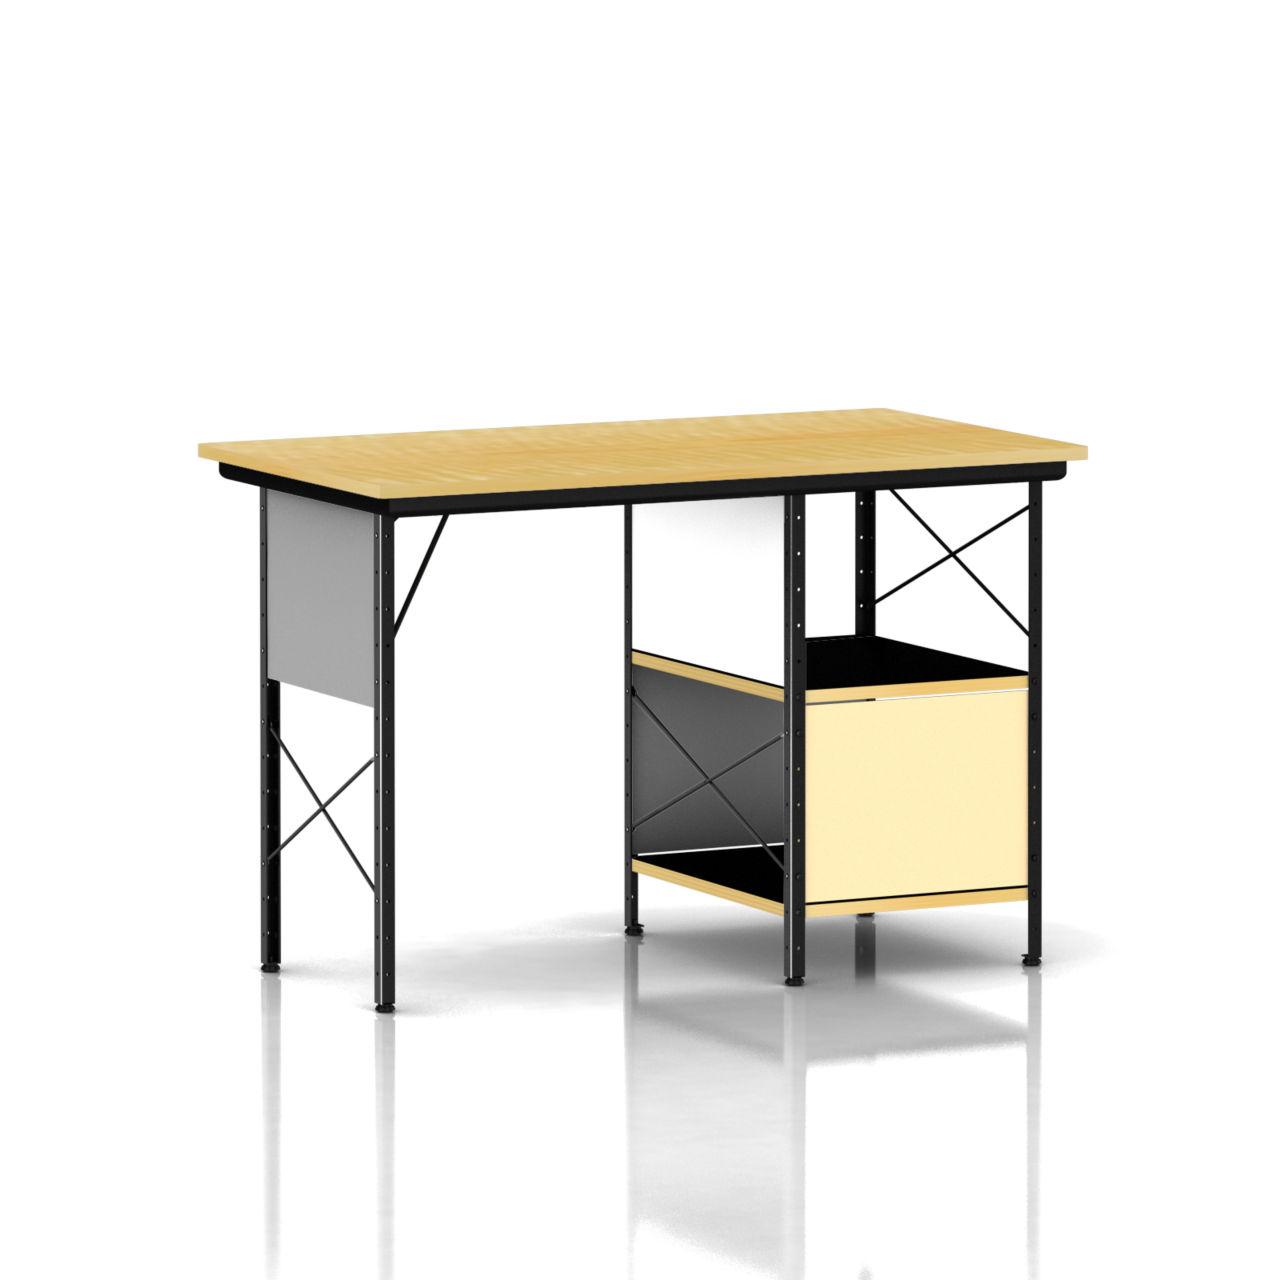 Eames Desk Unit in Neutral by Herman Miller